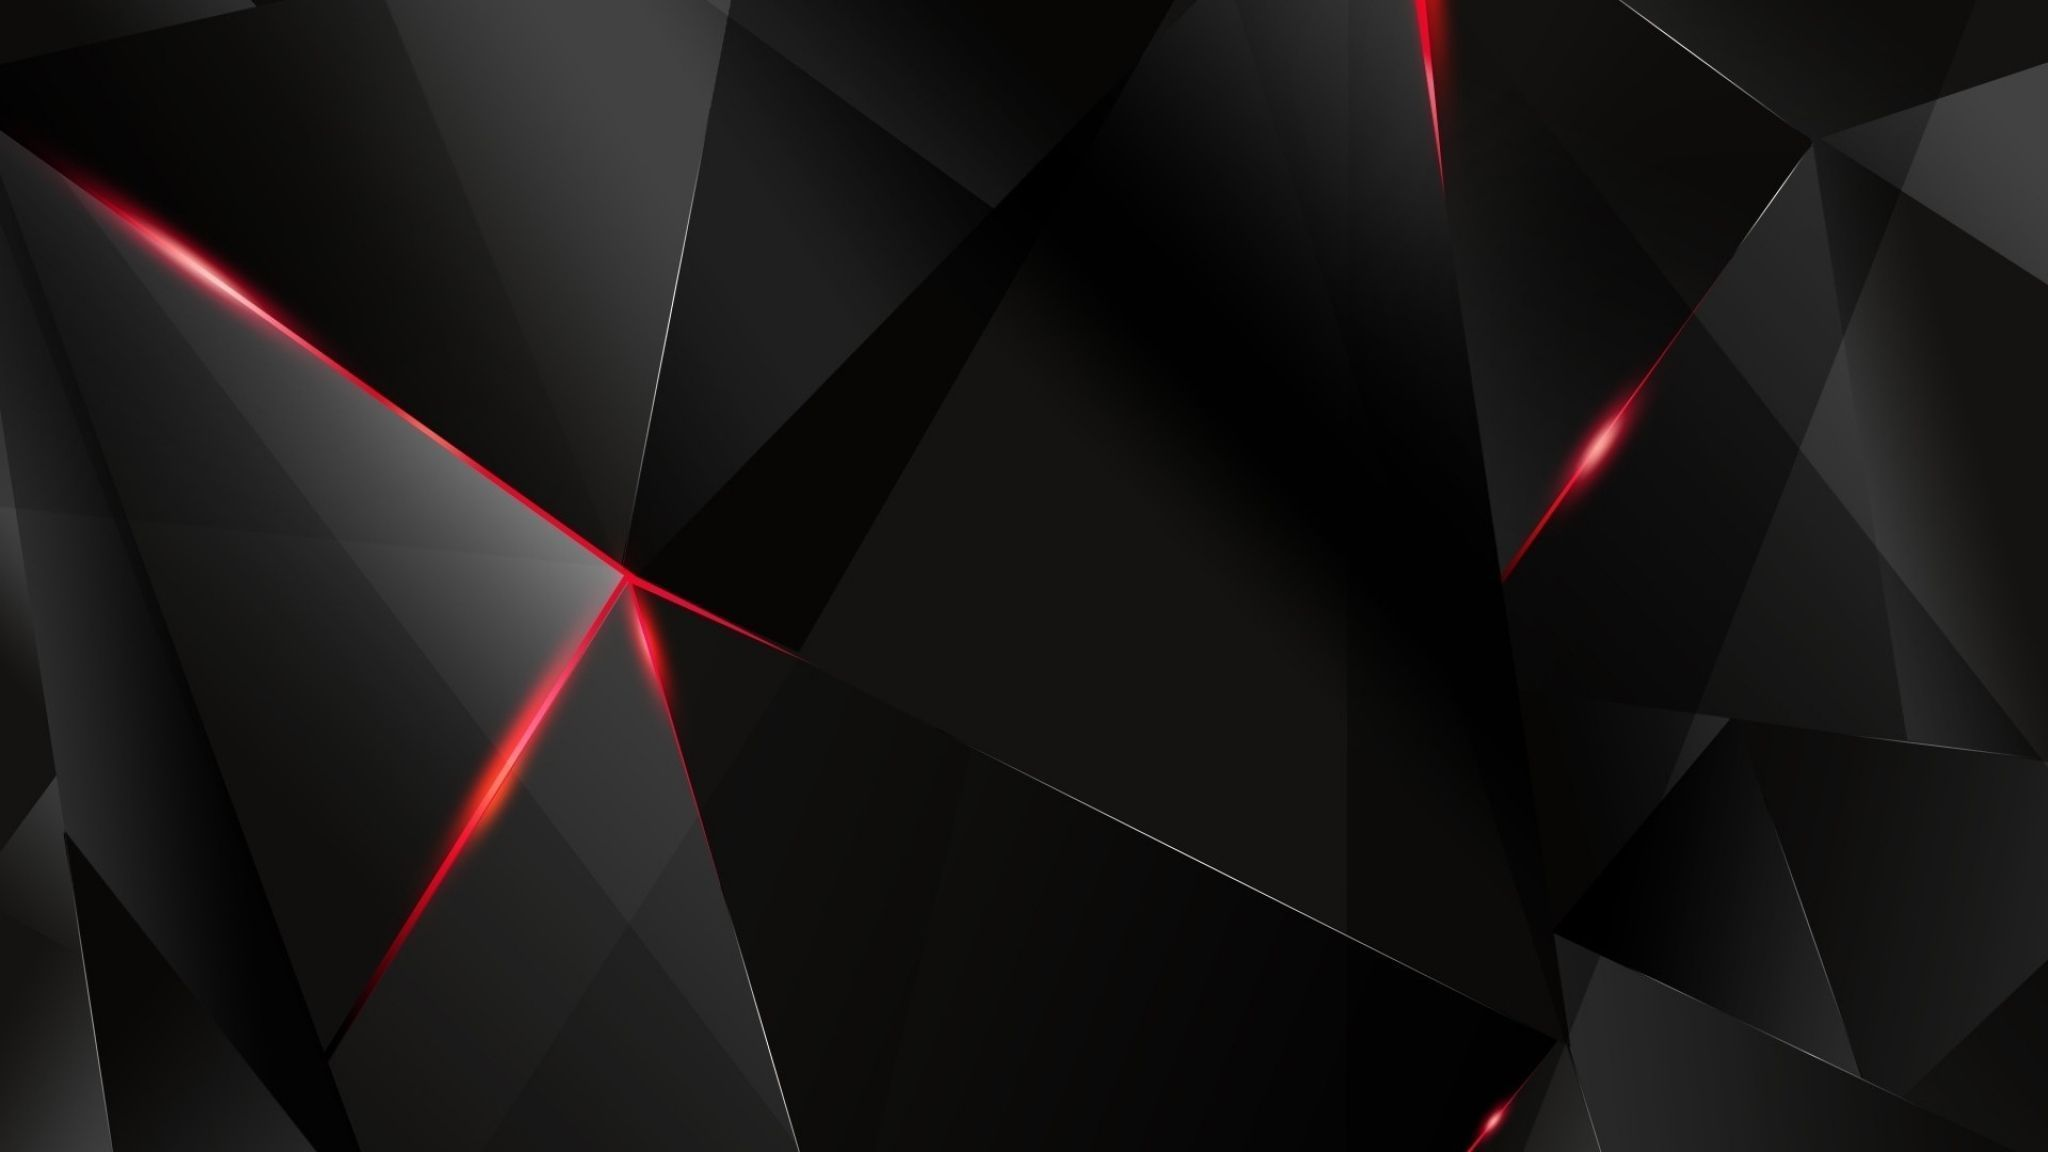 Hd Black Wallpapers Hd Desktop Backgrounds 2048x1152 Red And Black Wallpaper Dark Black Wallpaper Dark Wallpaper